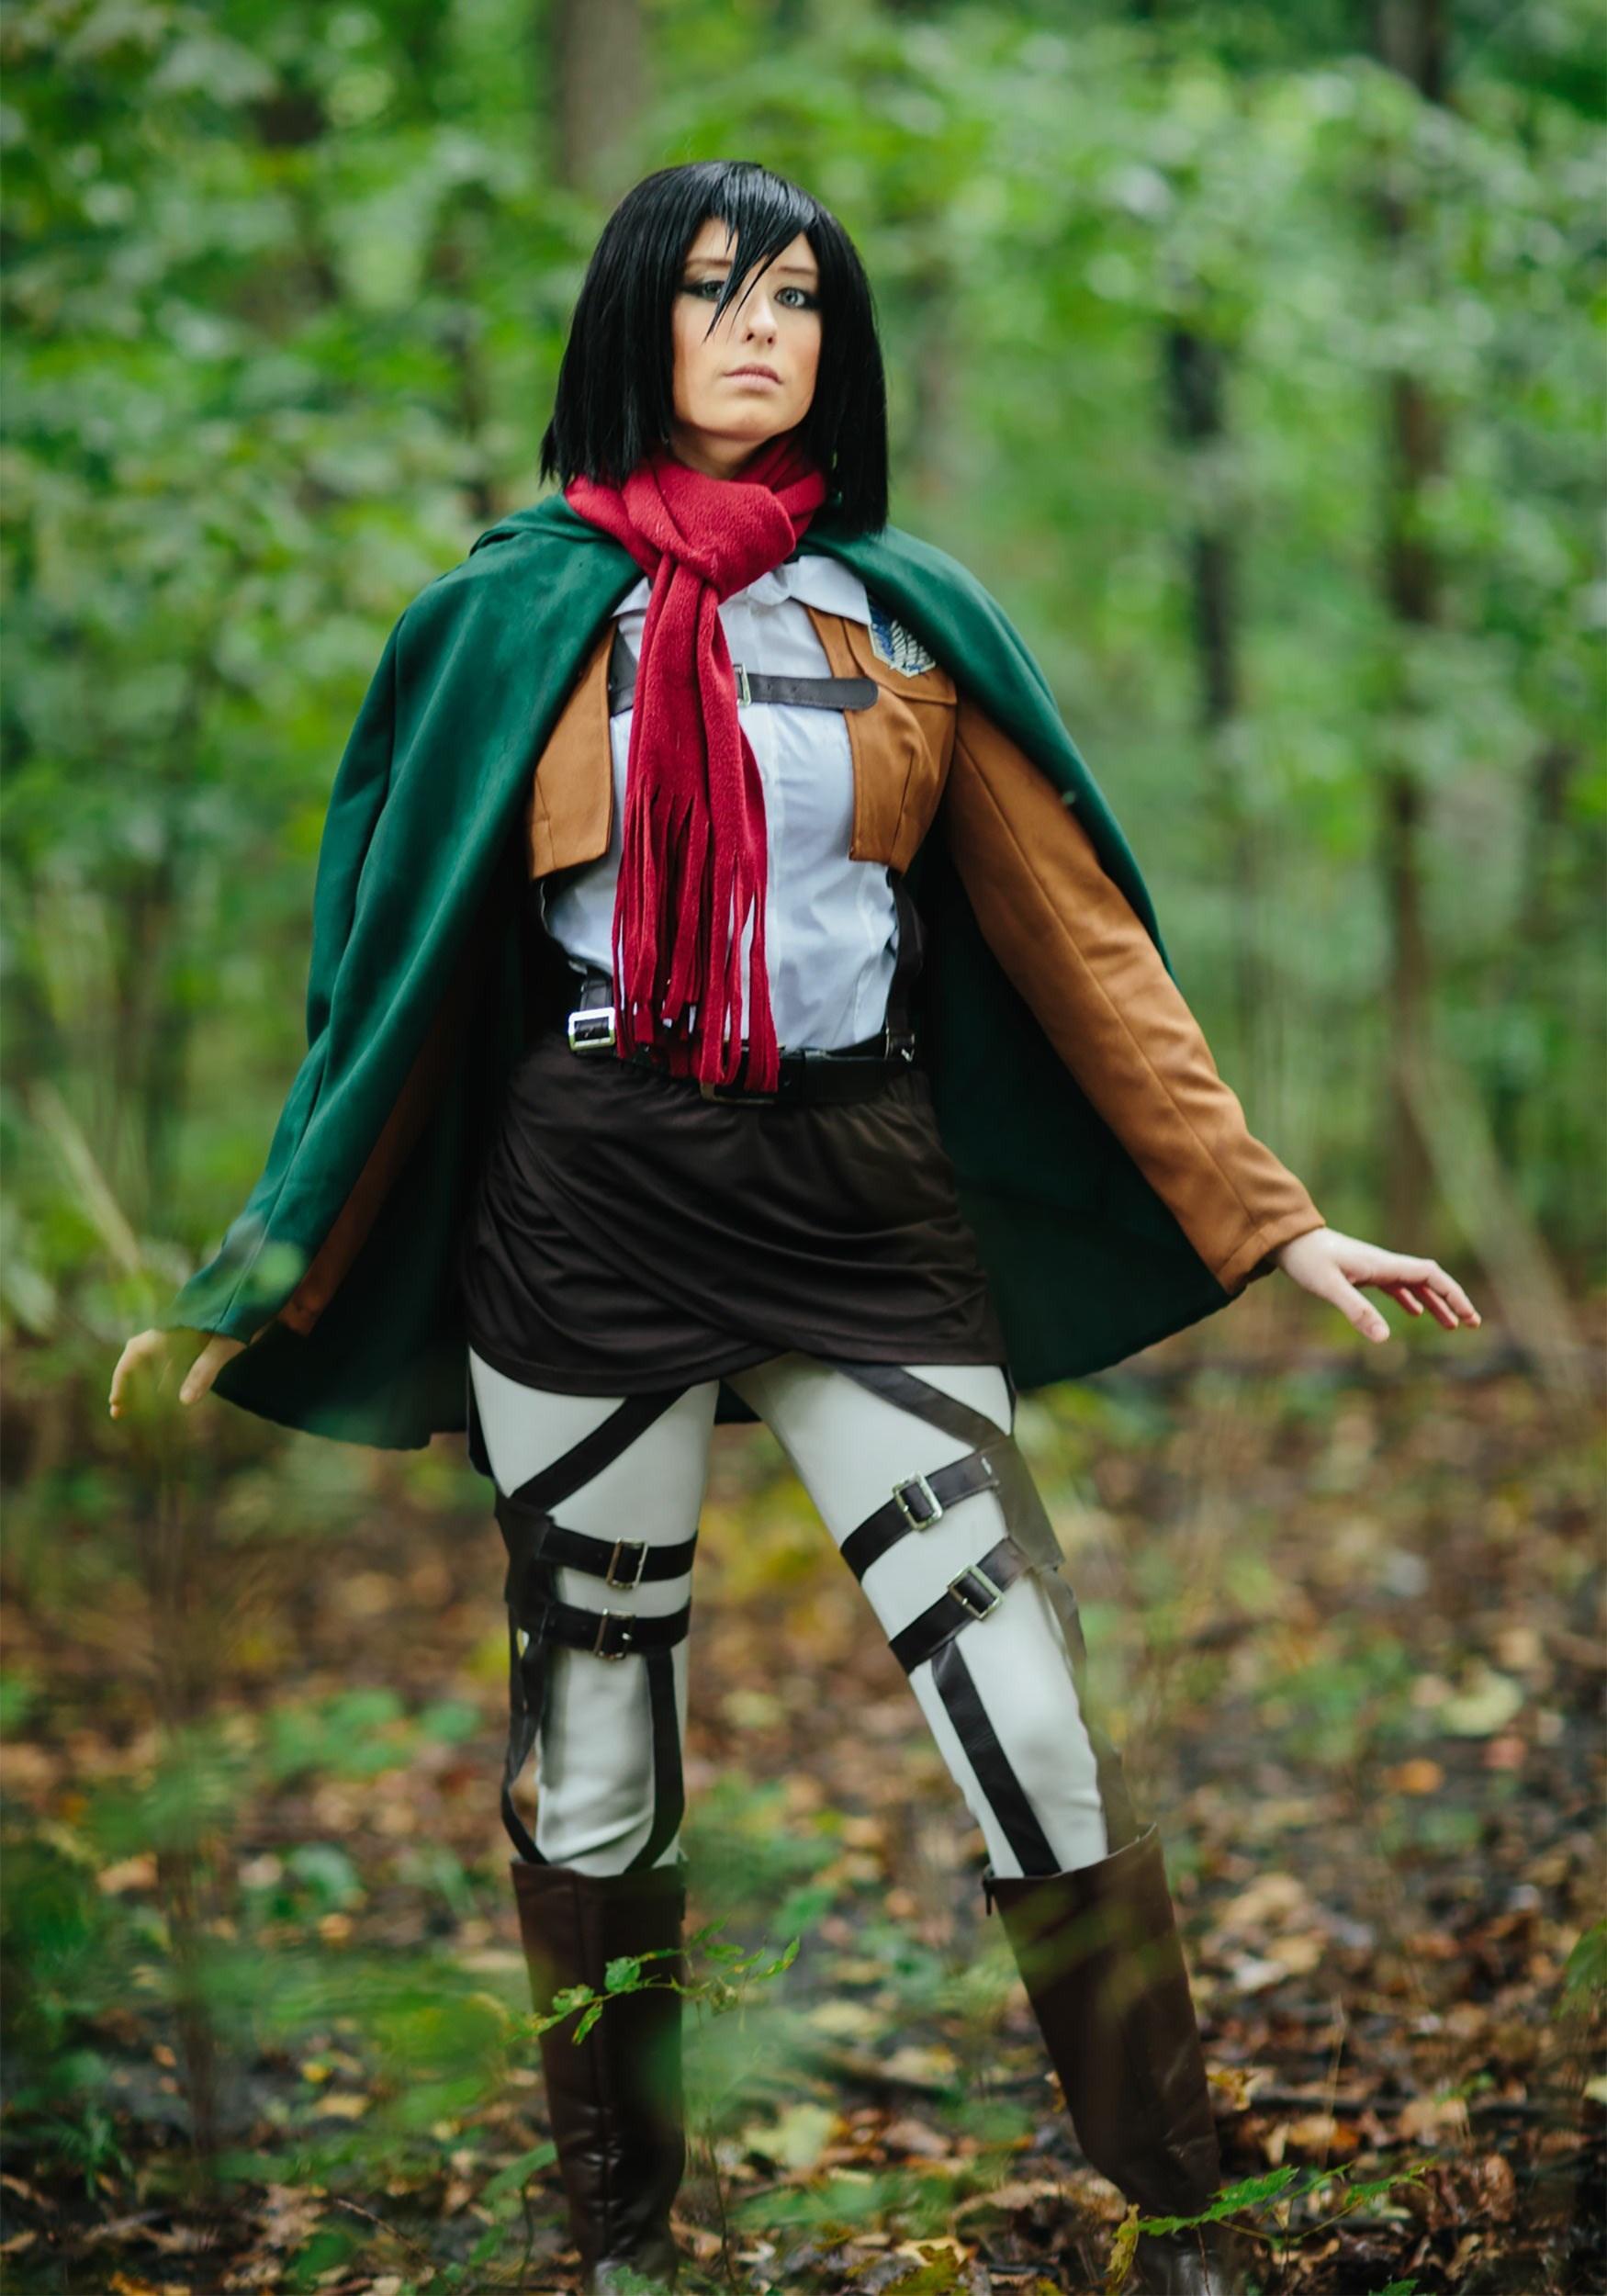 Deluxe Attack on Titan Mikasa Costume   Women's Cosplay Costume